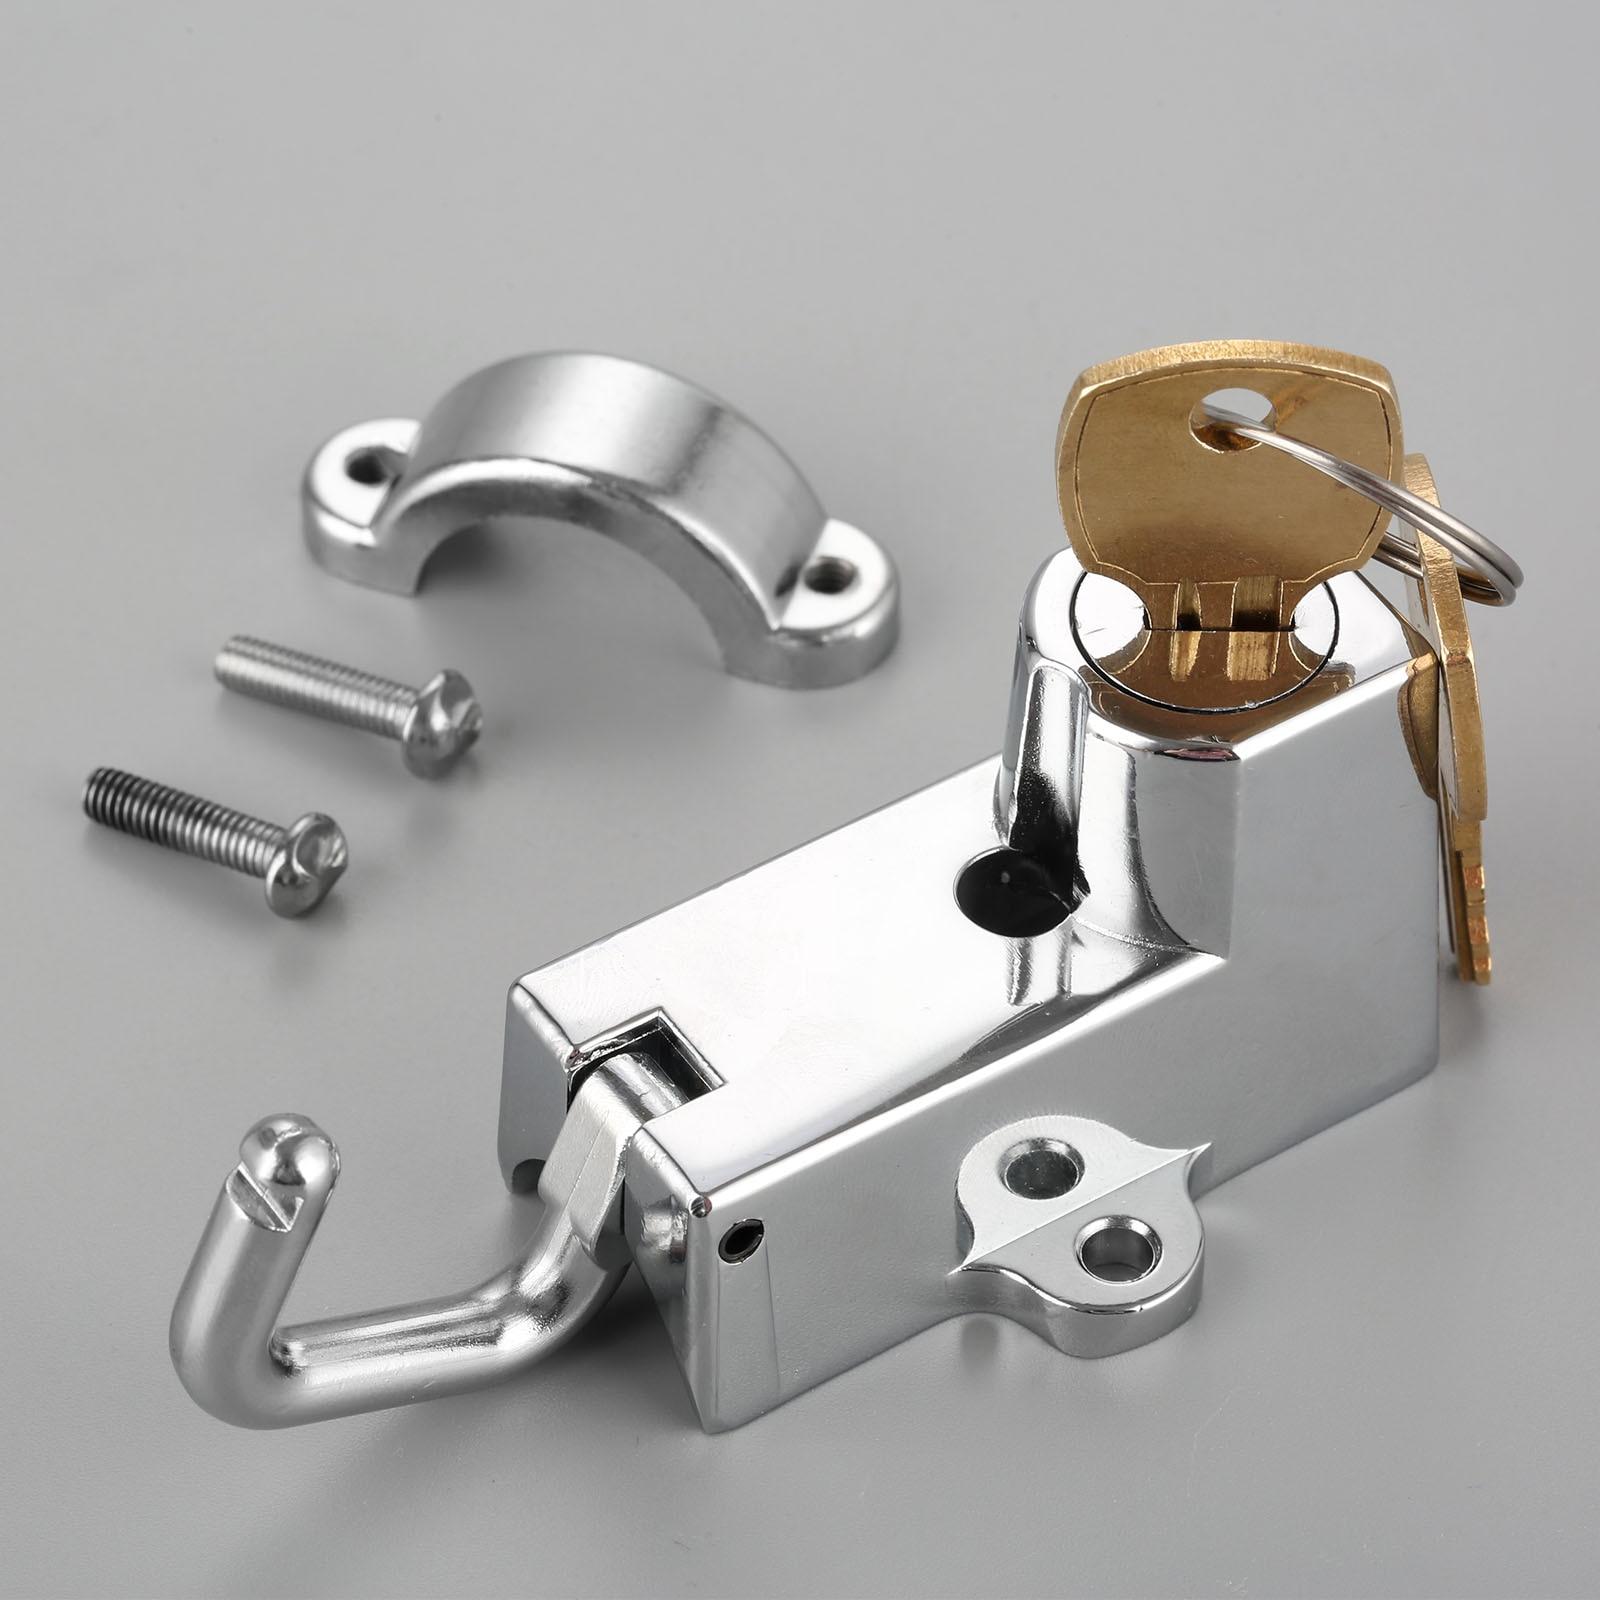 Motorcycle Helmet Lock With 2 Keys For Chrome Black 22mm 7/8